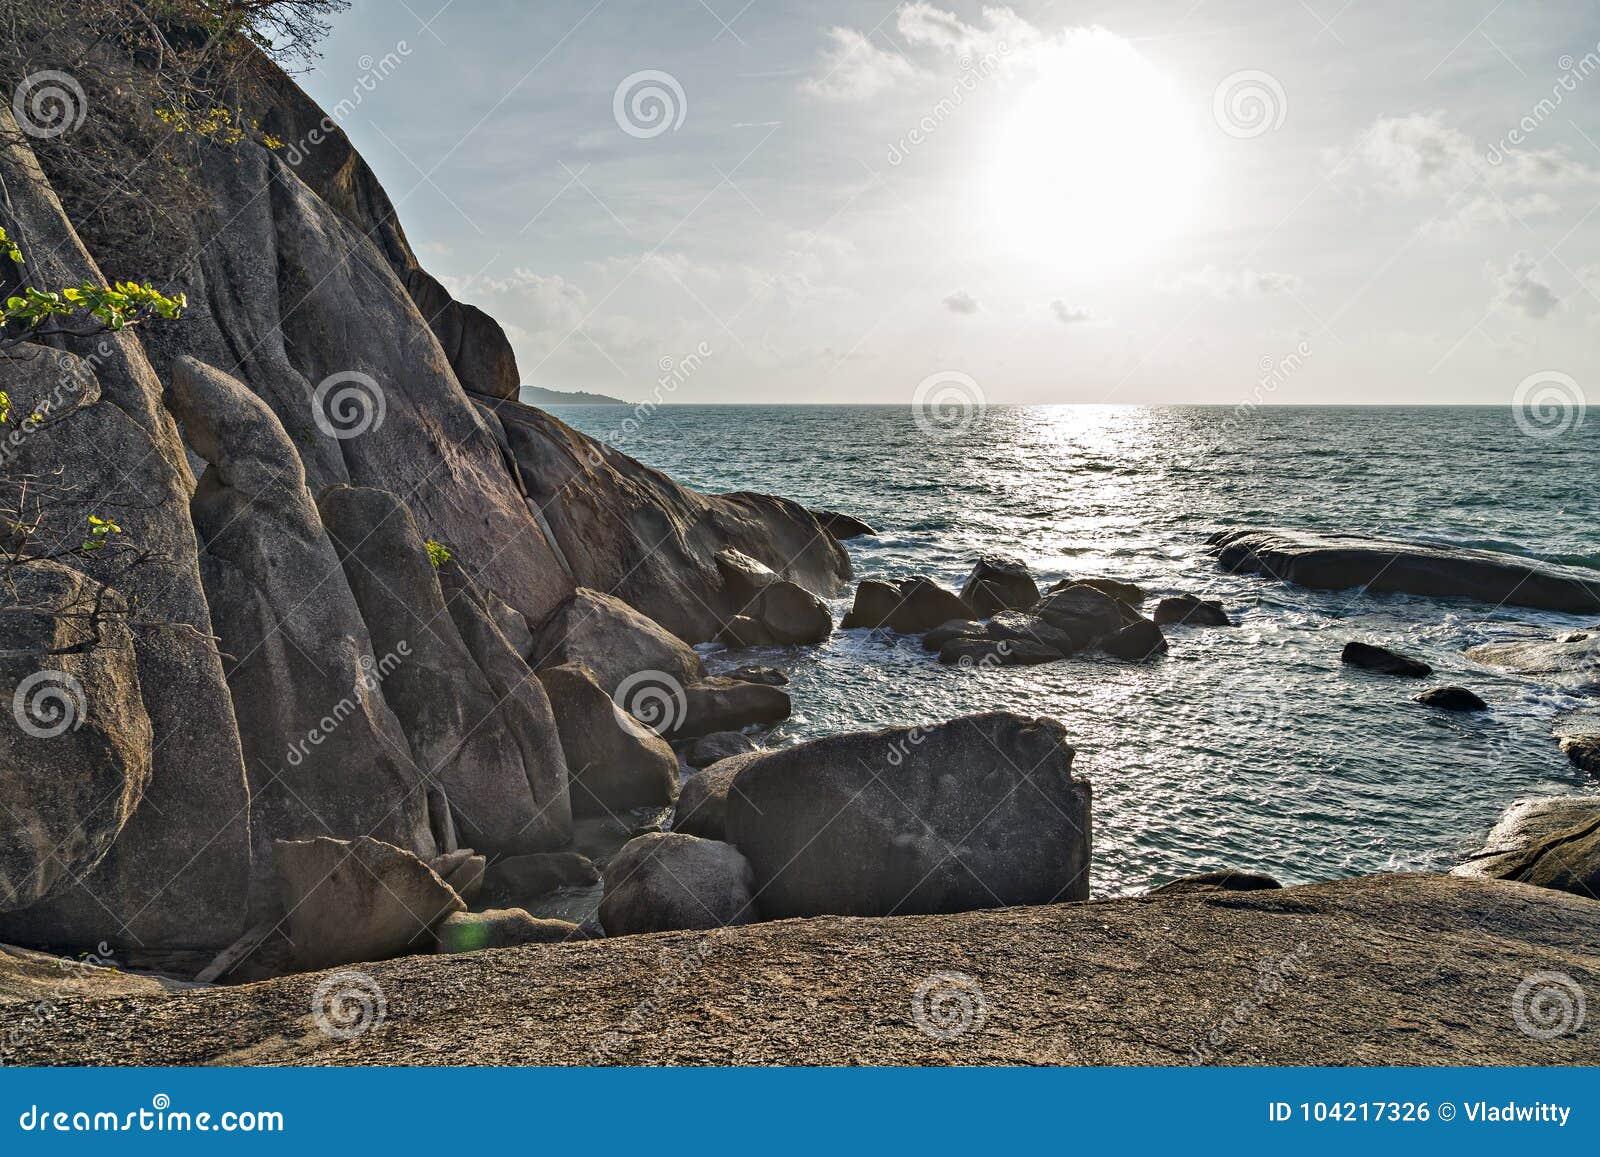 La roca de abuelo, un pene